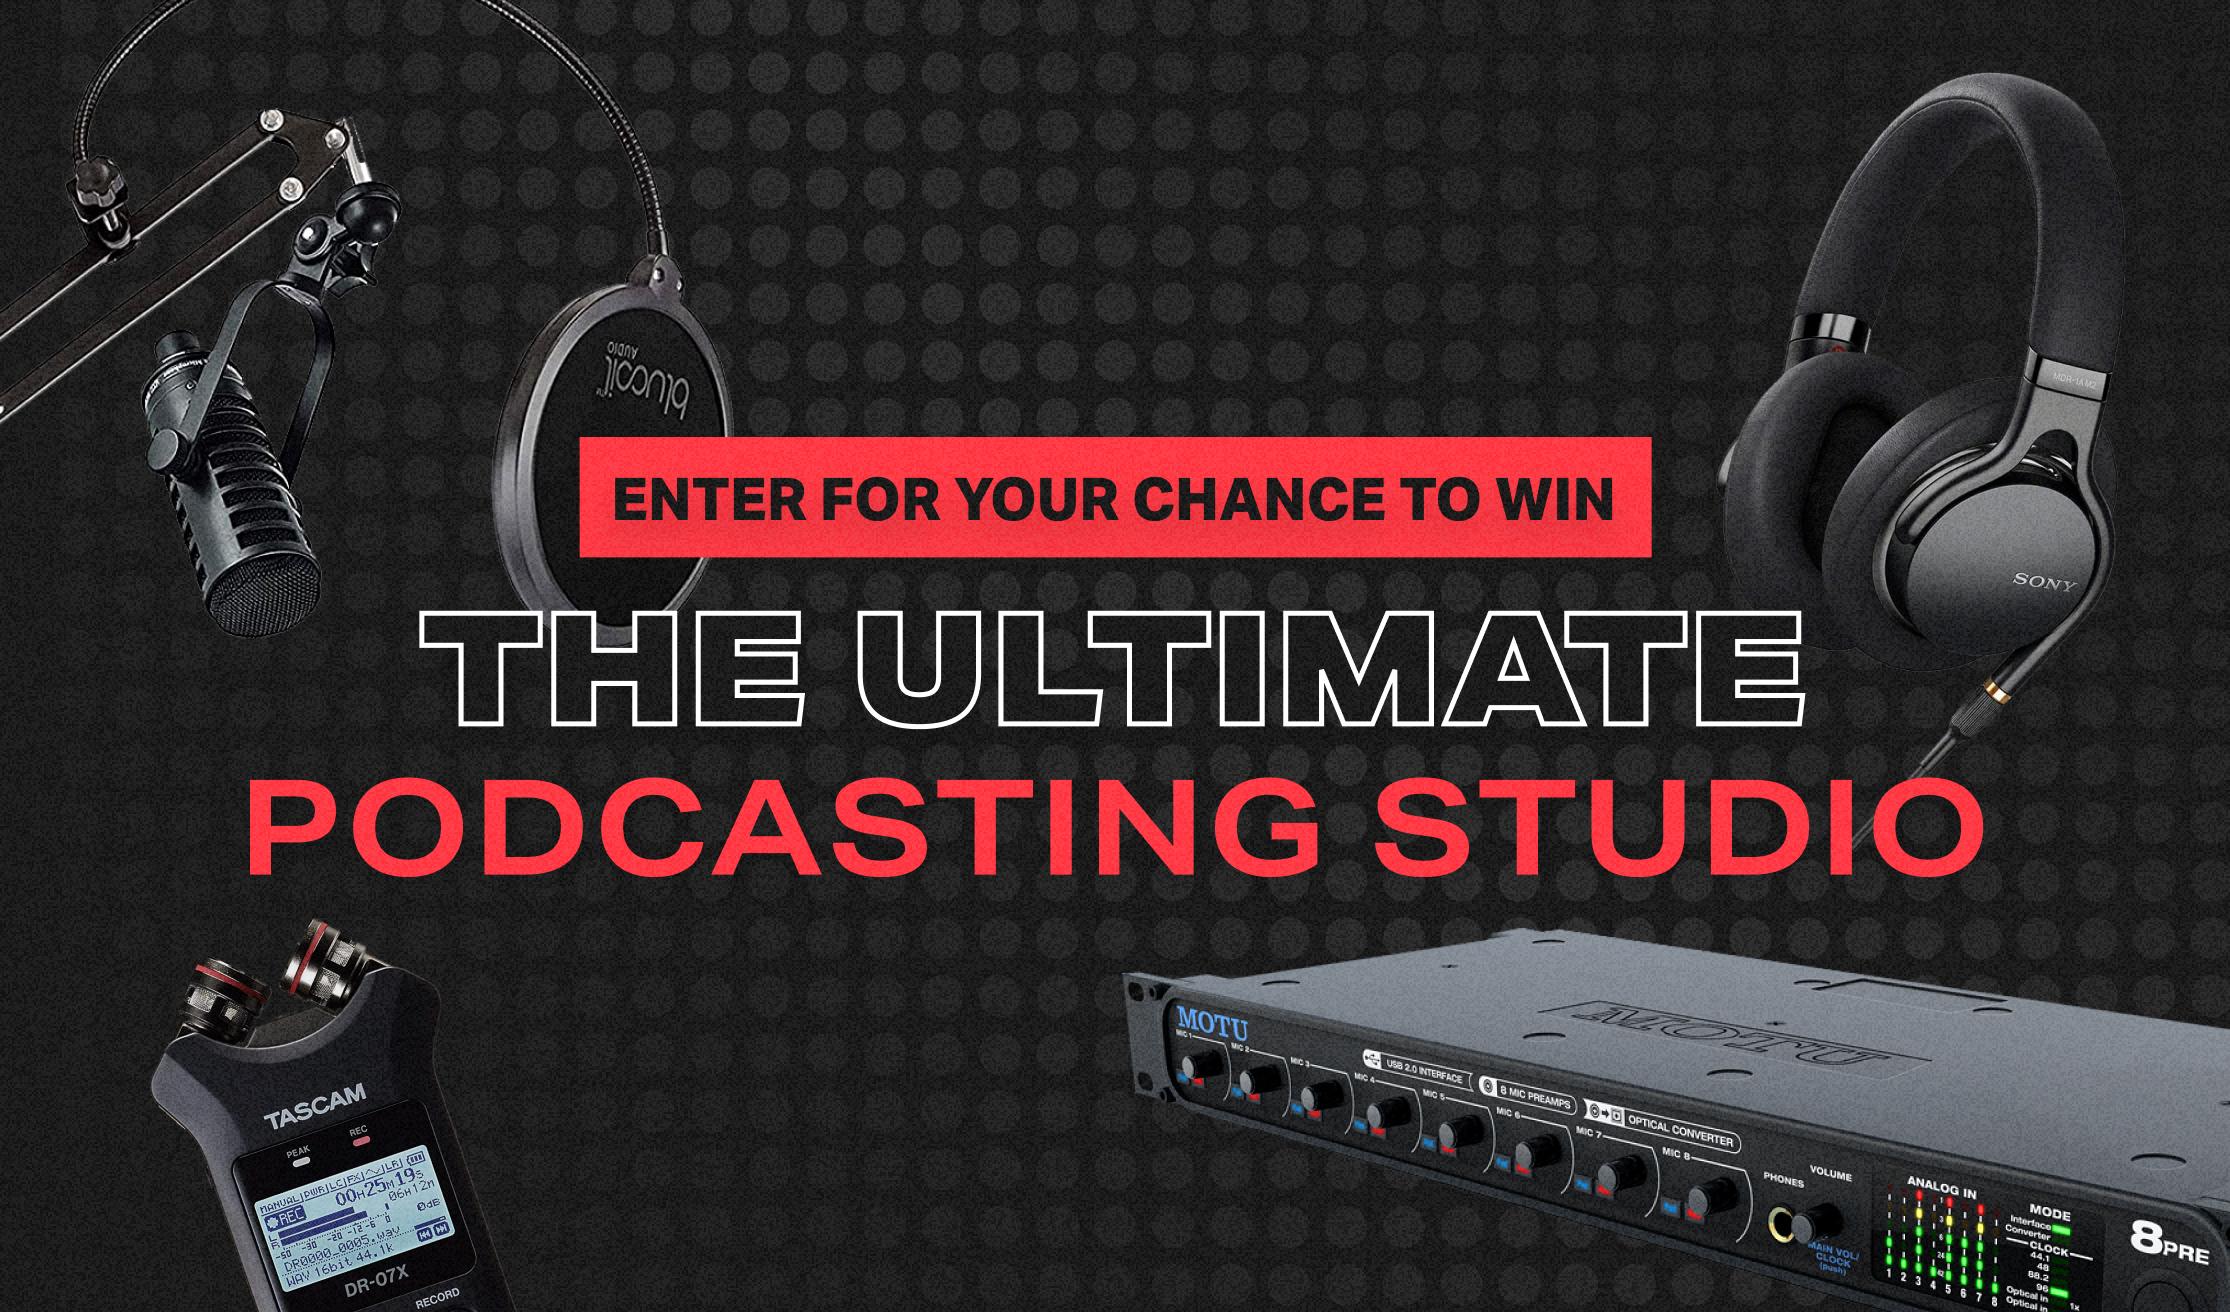 the-ultimate-podcasting-studio